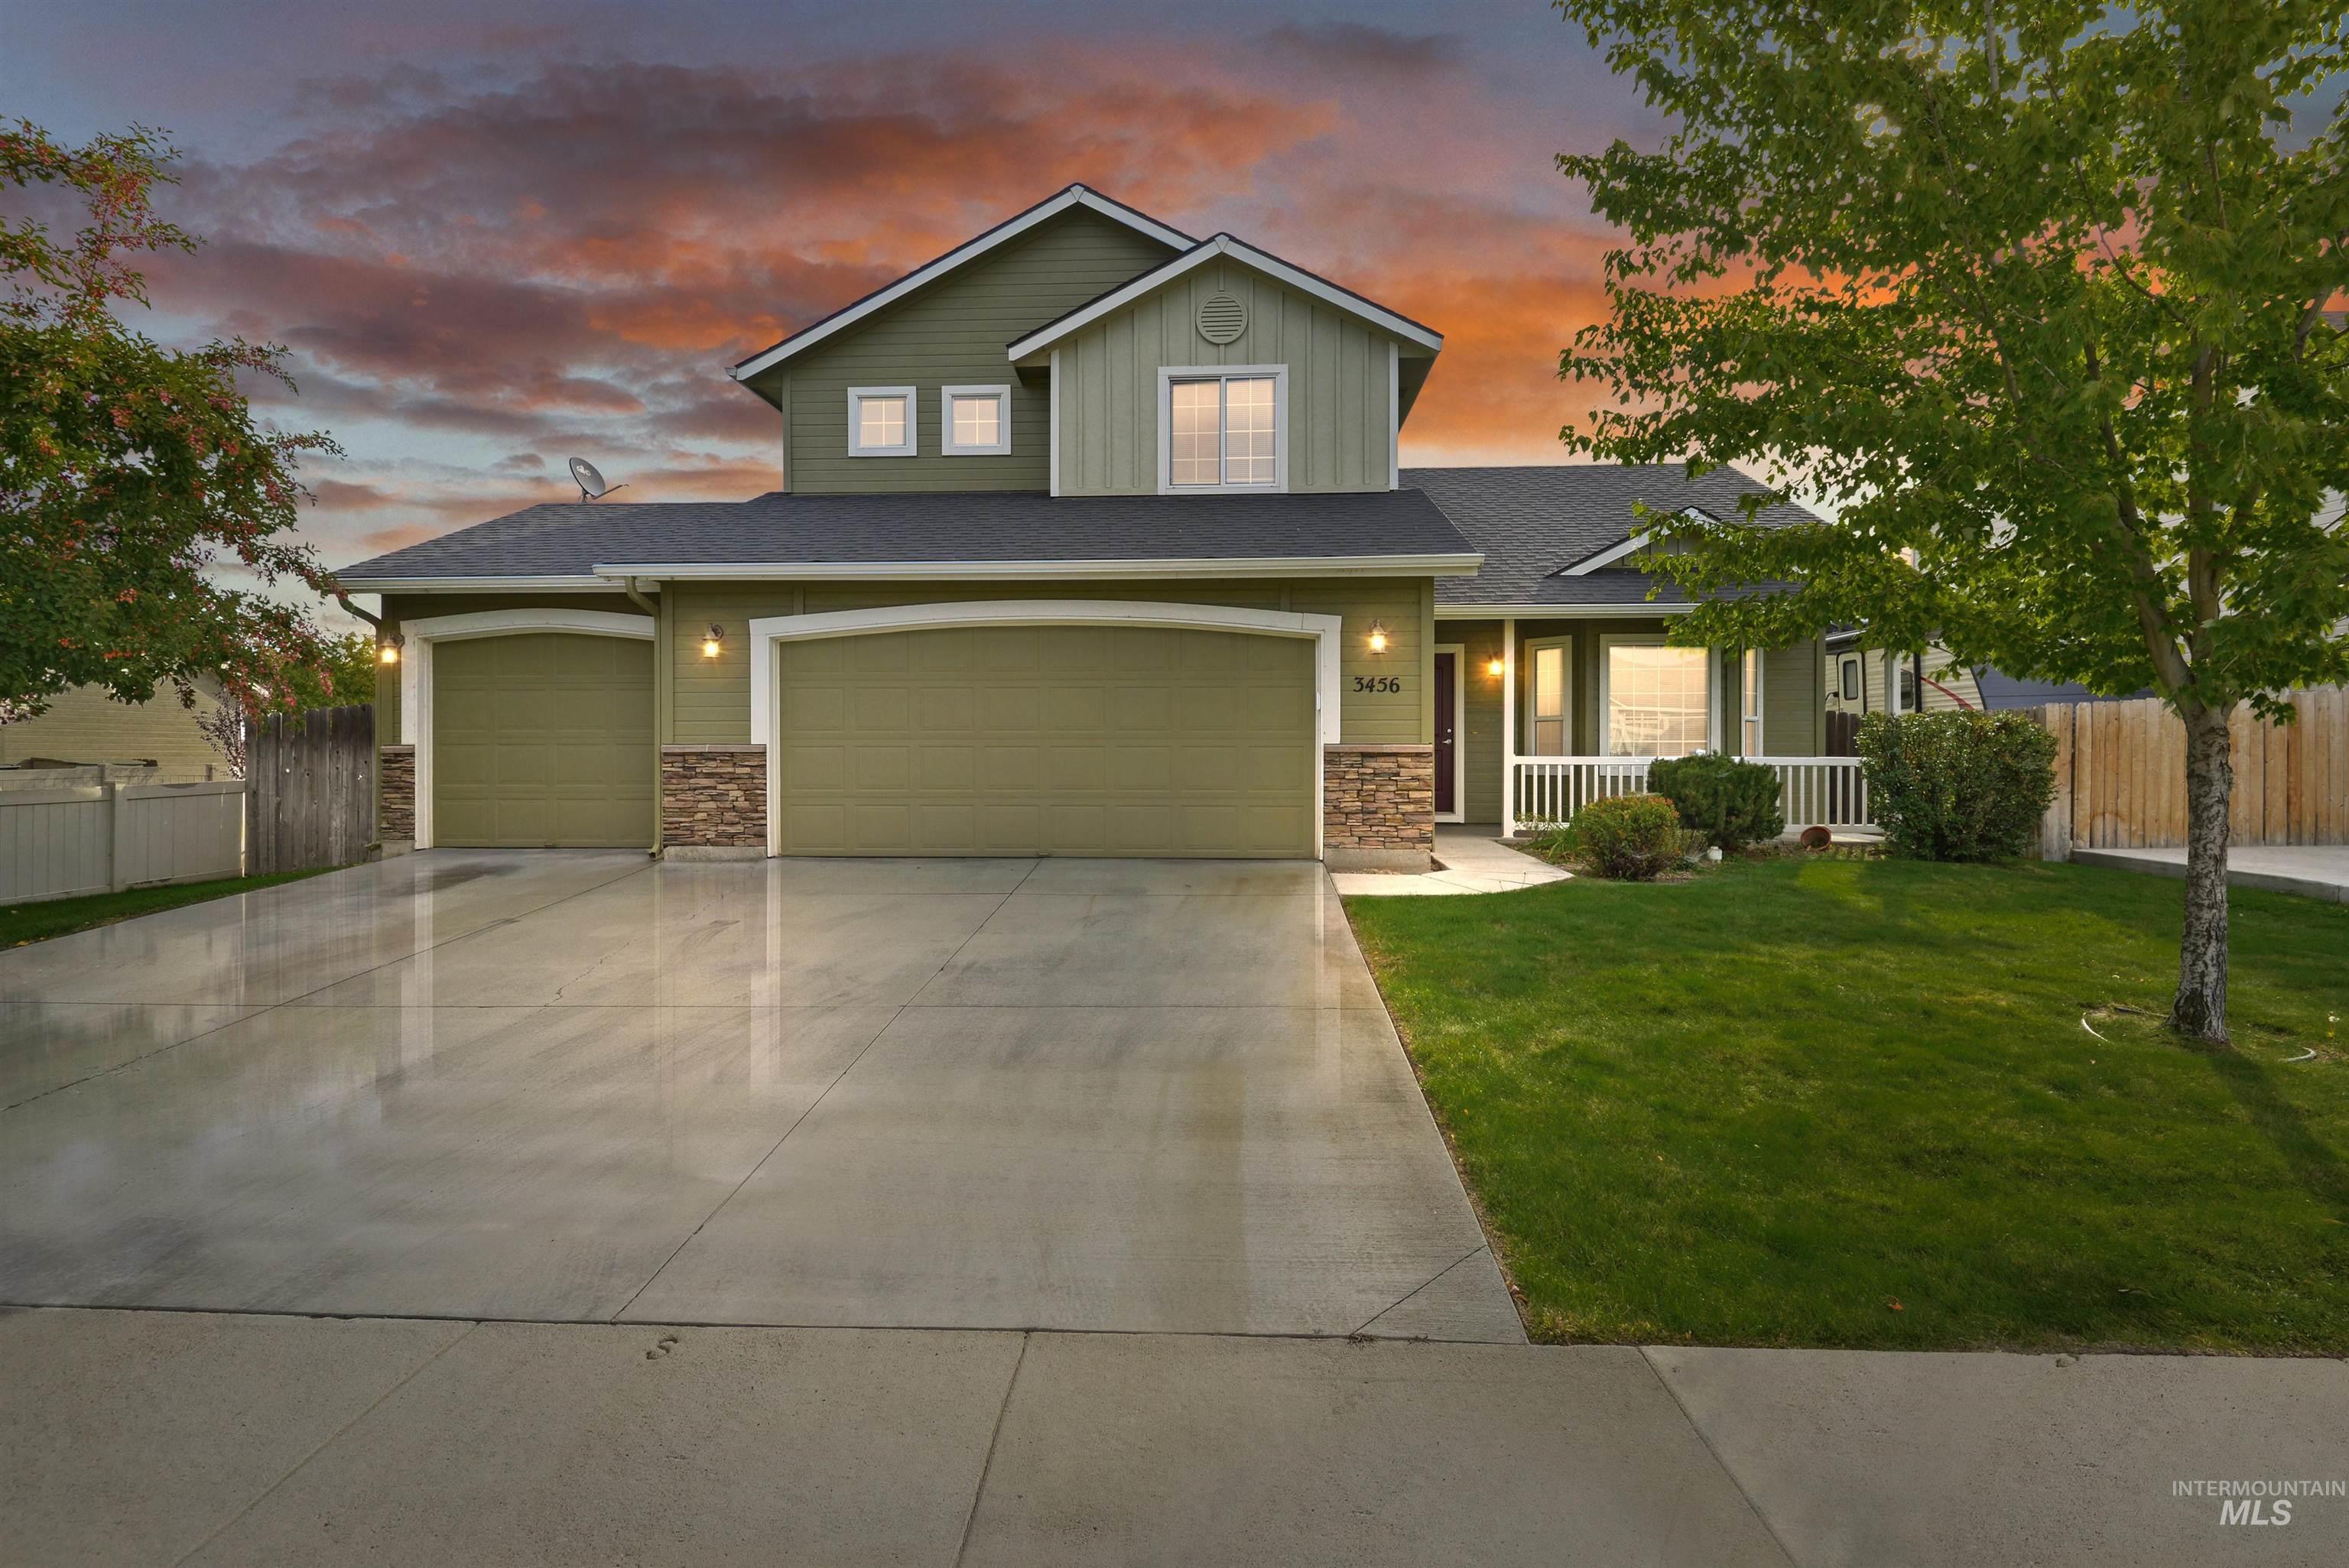 3456 N Maplestone Ave Property Photo